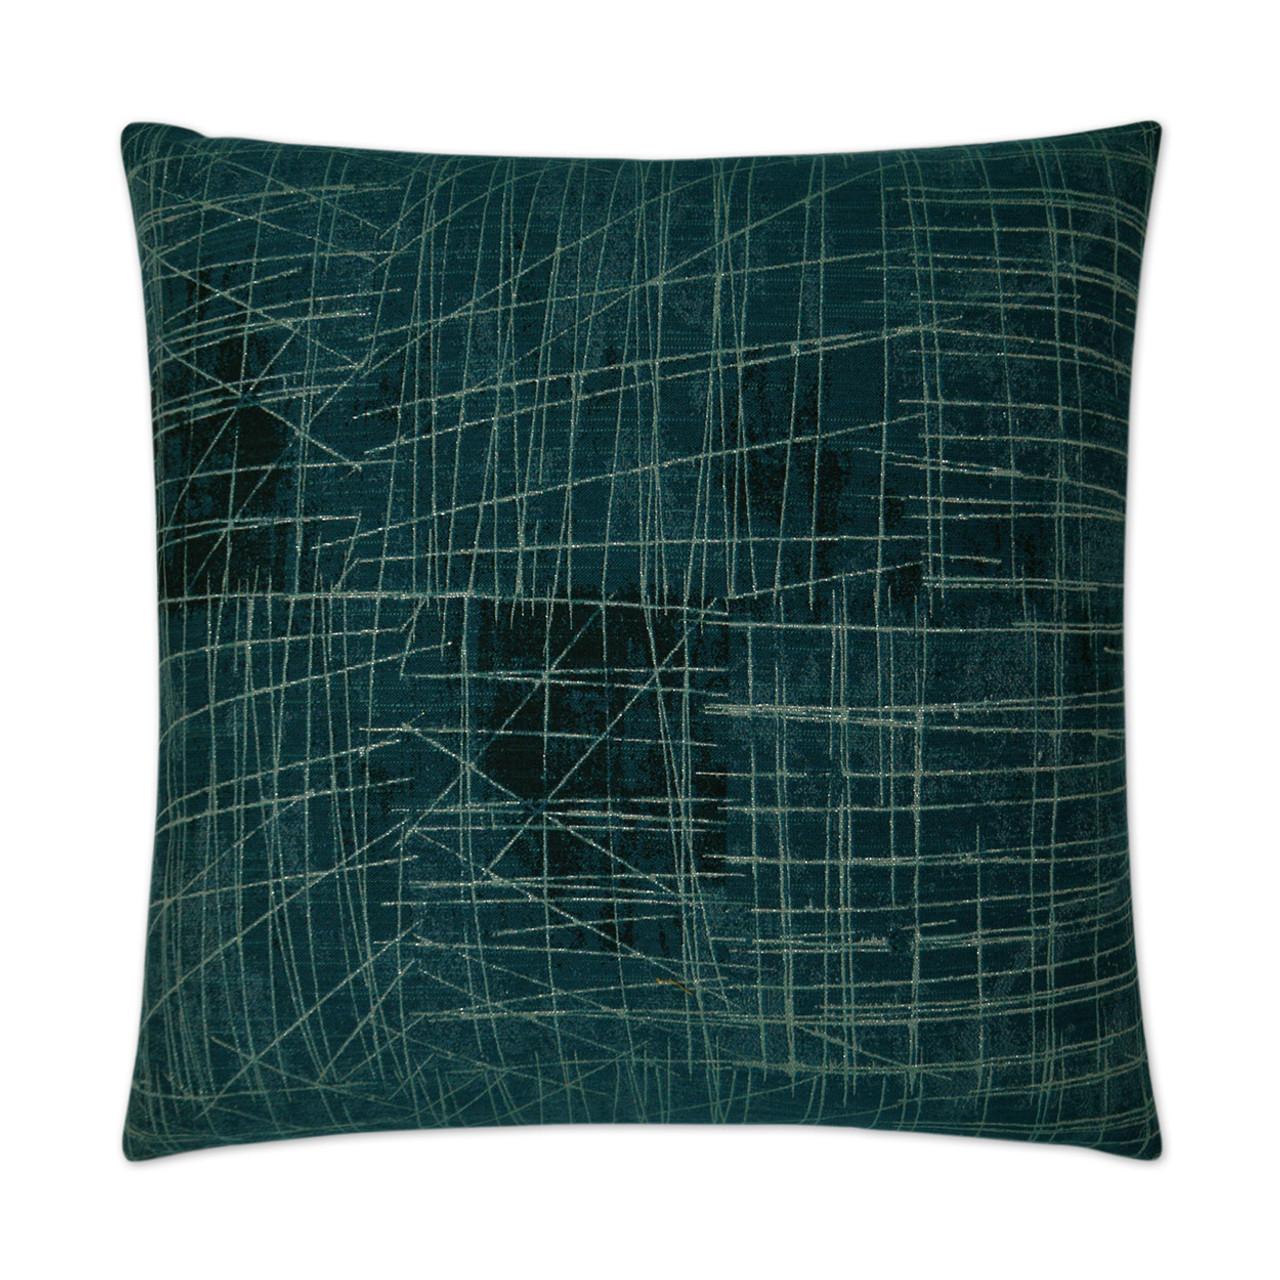 Studio-Peacock Throw Pillow